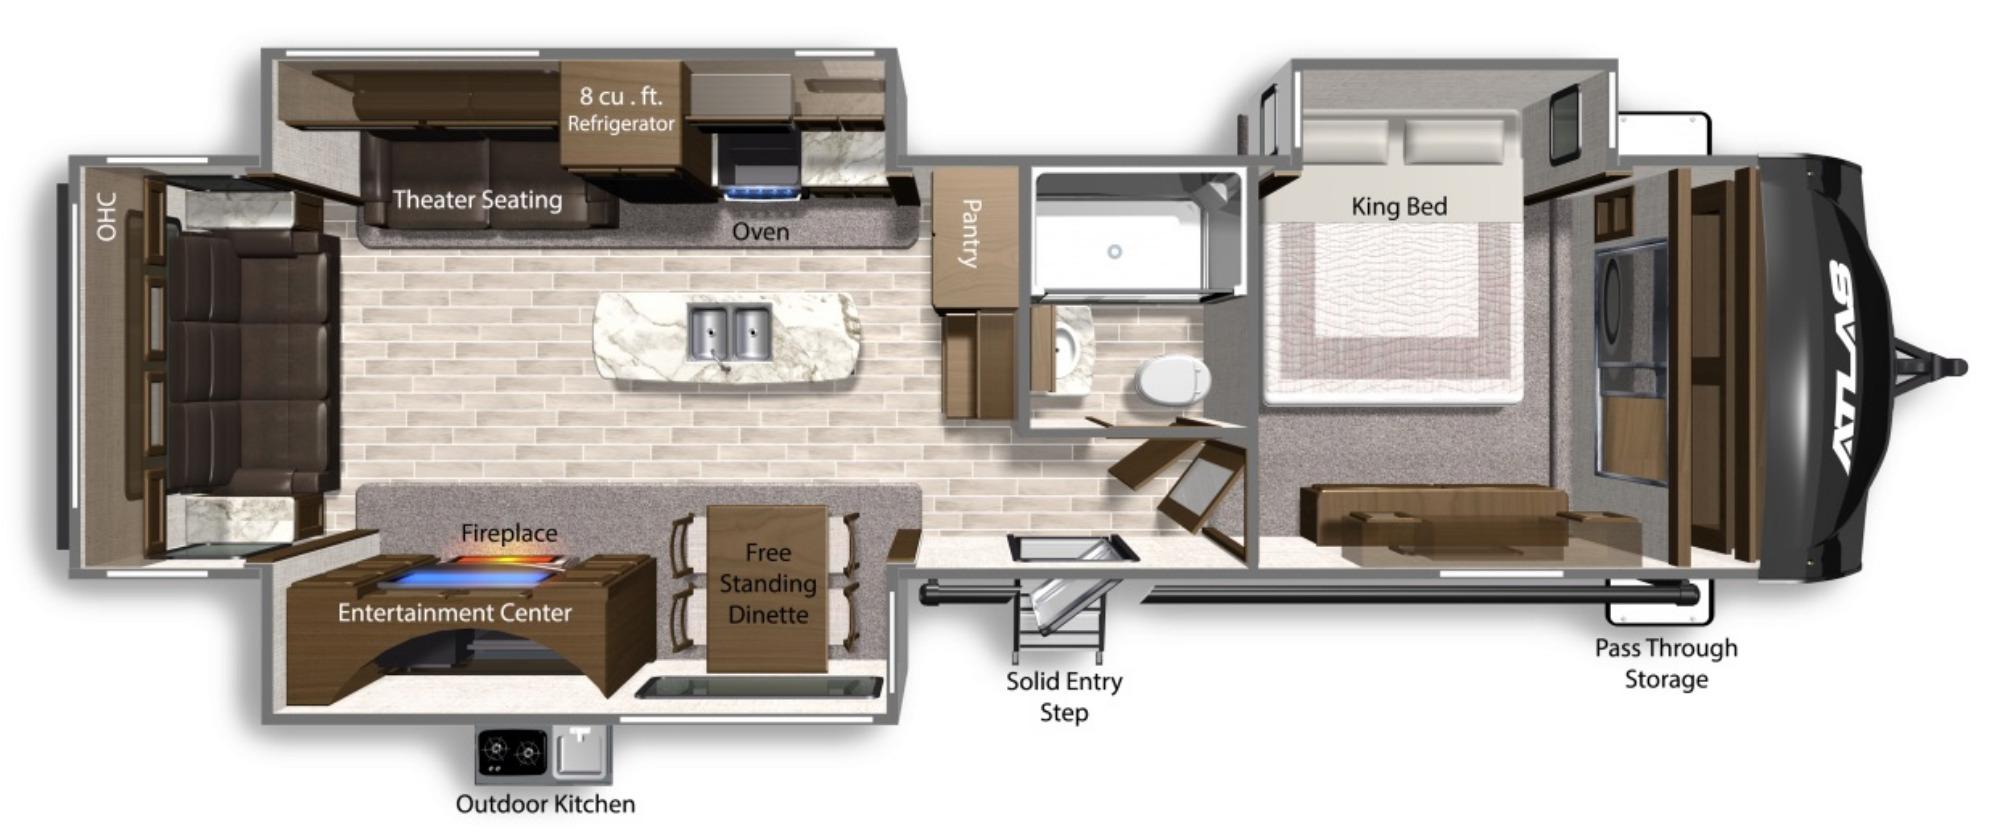 View Floor Plan for 2022 DUTCHMEN ATLAS 3302RL